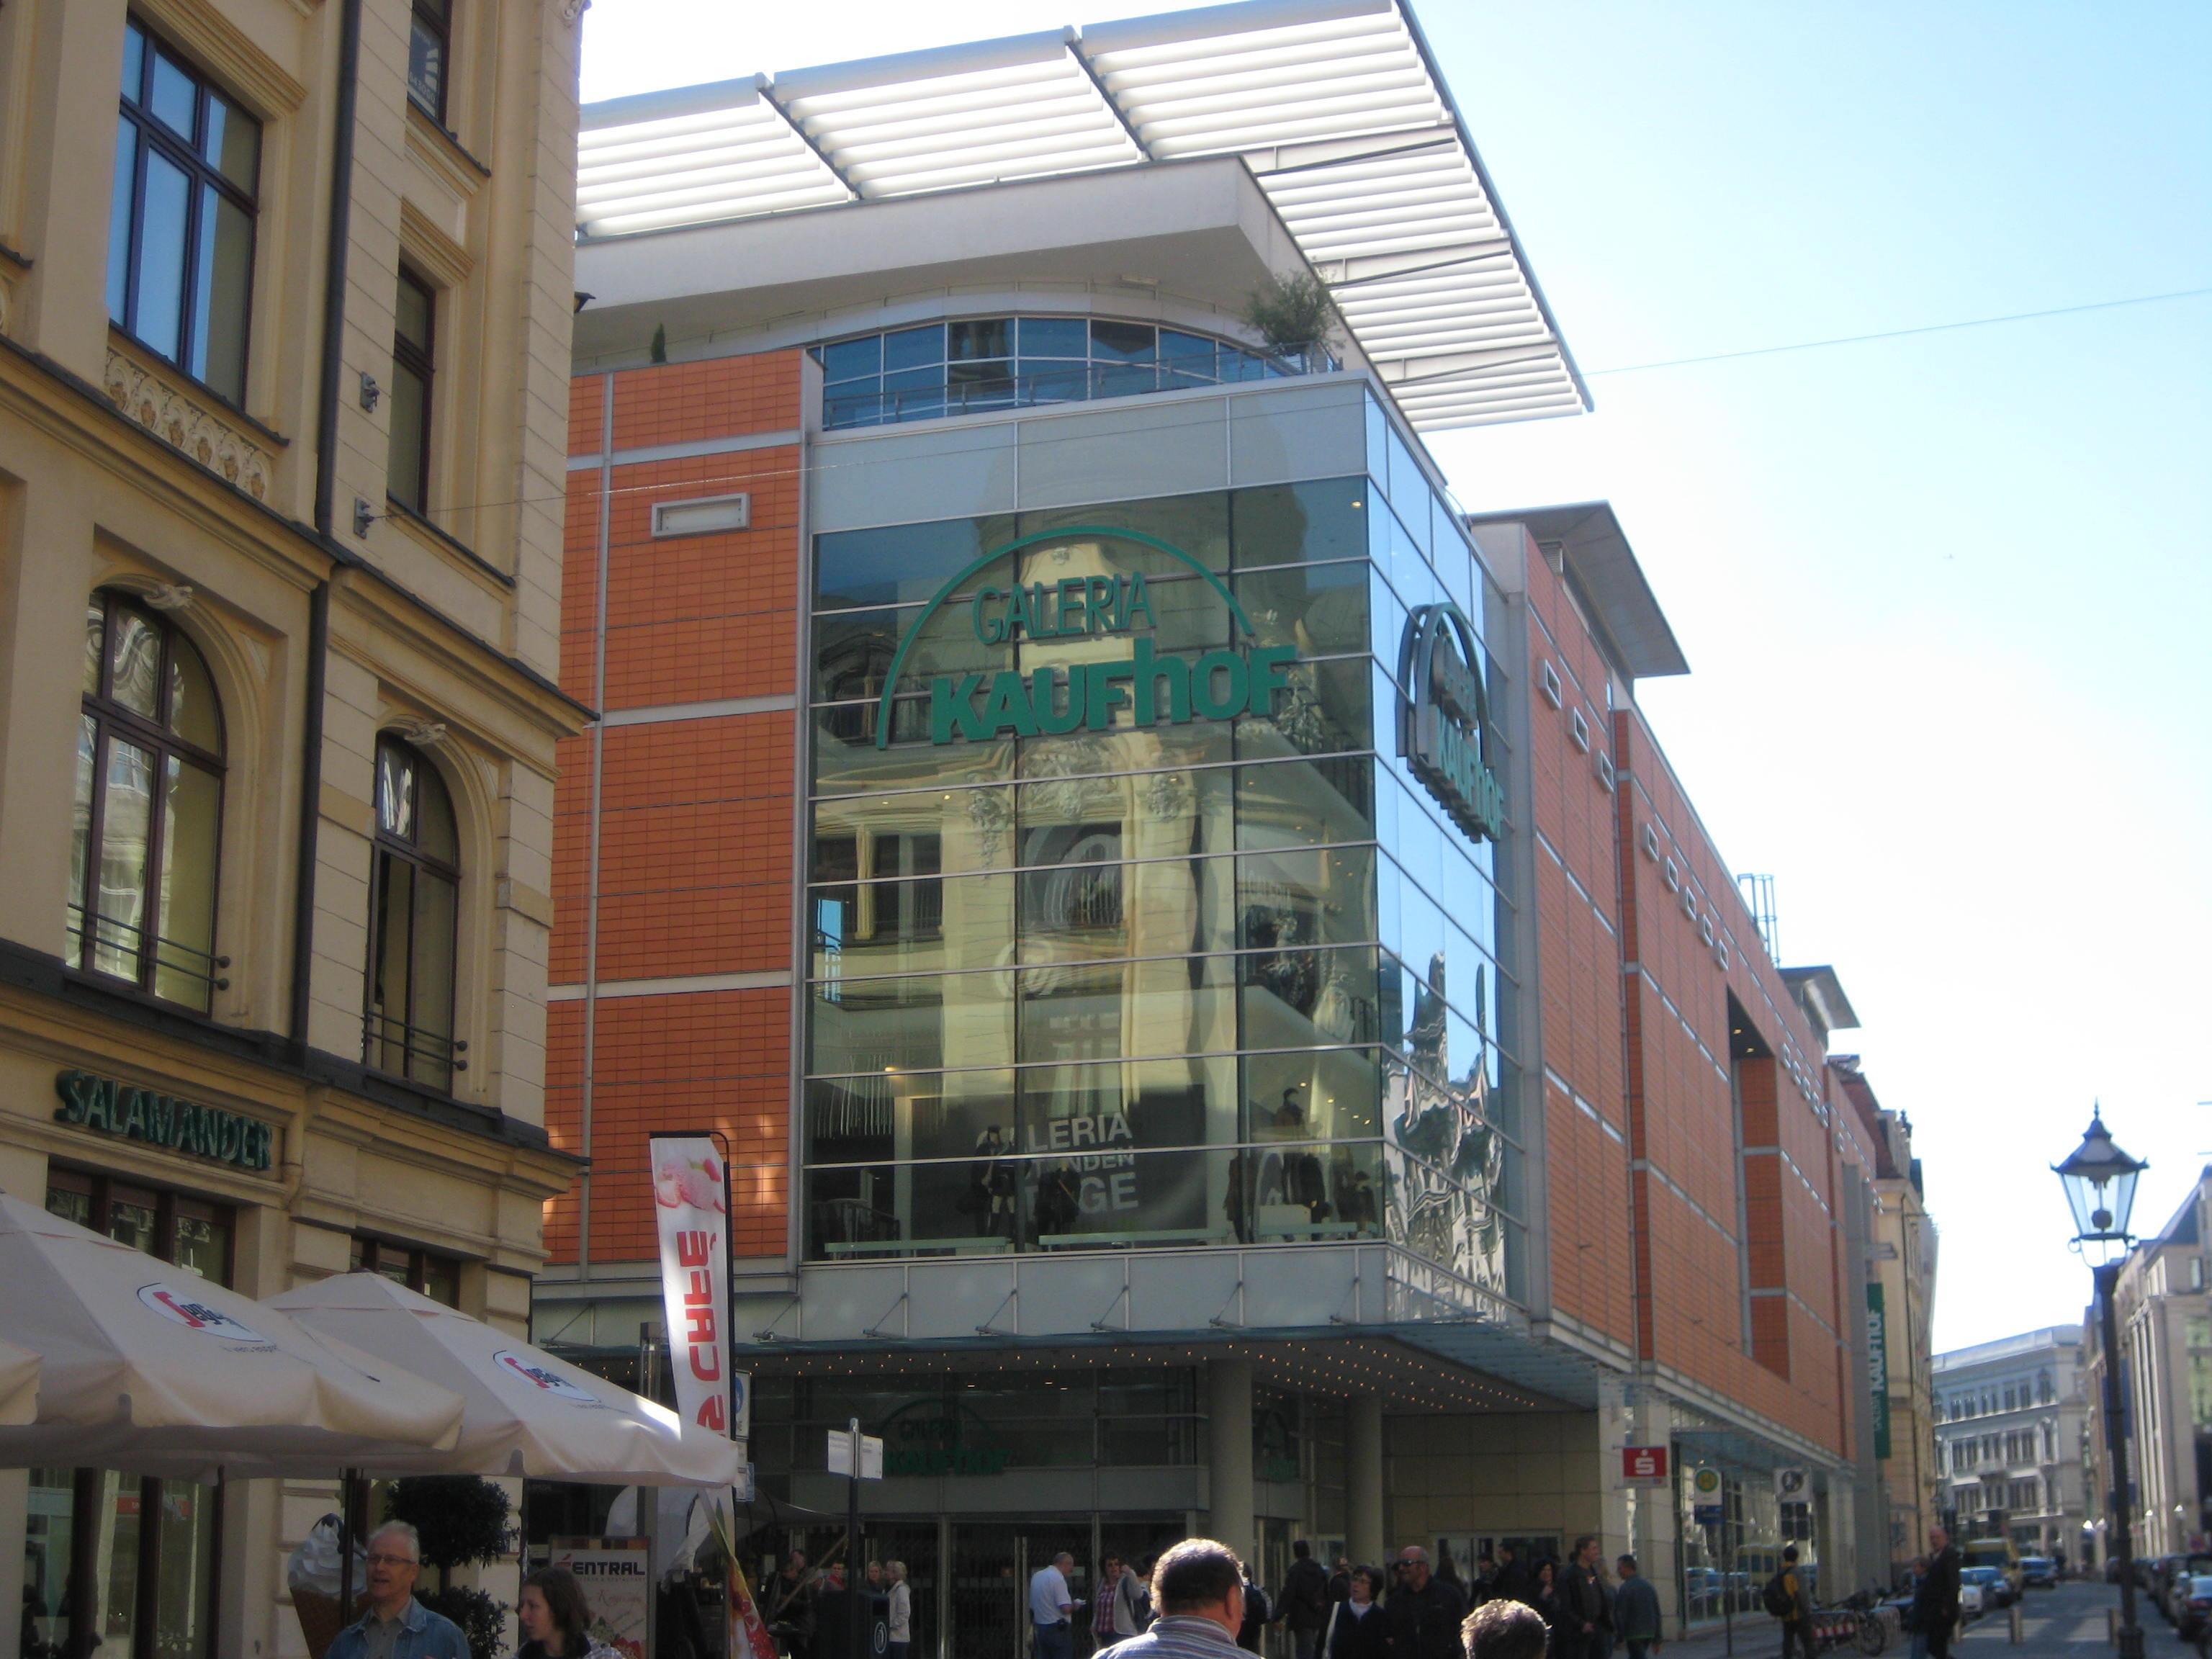 Htc Leipzig